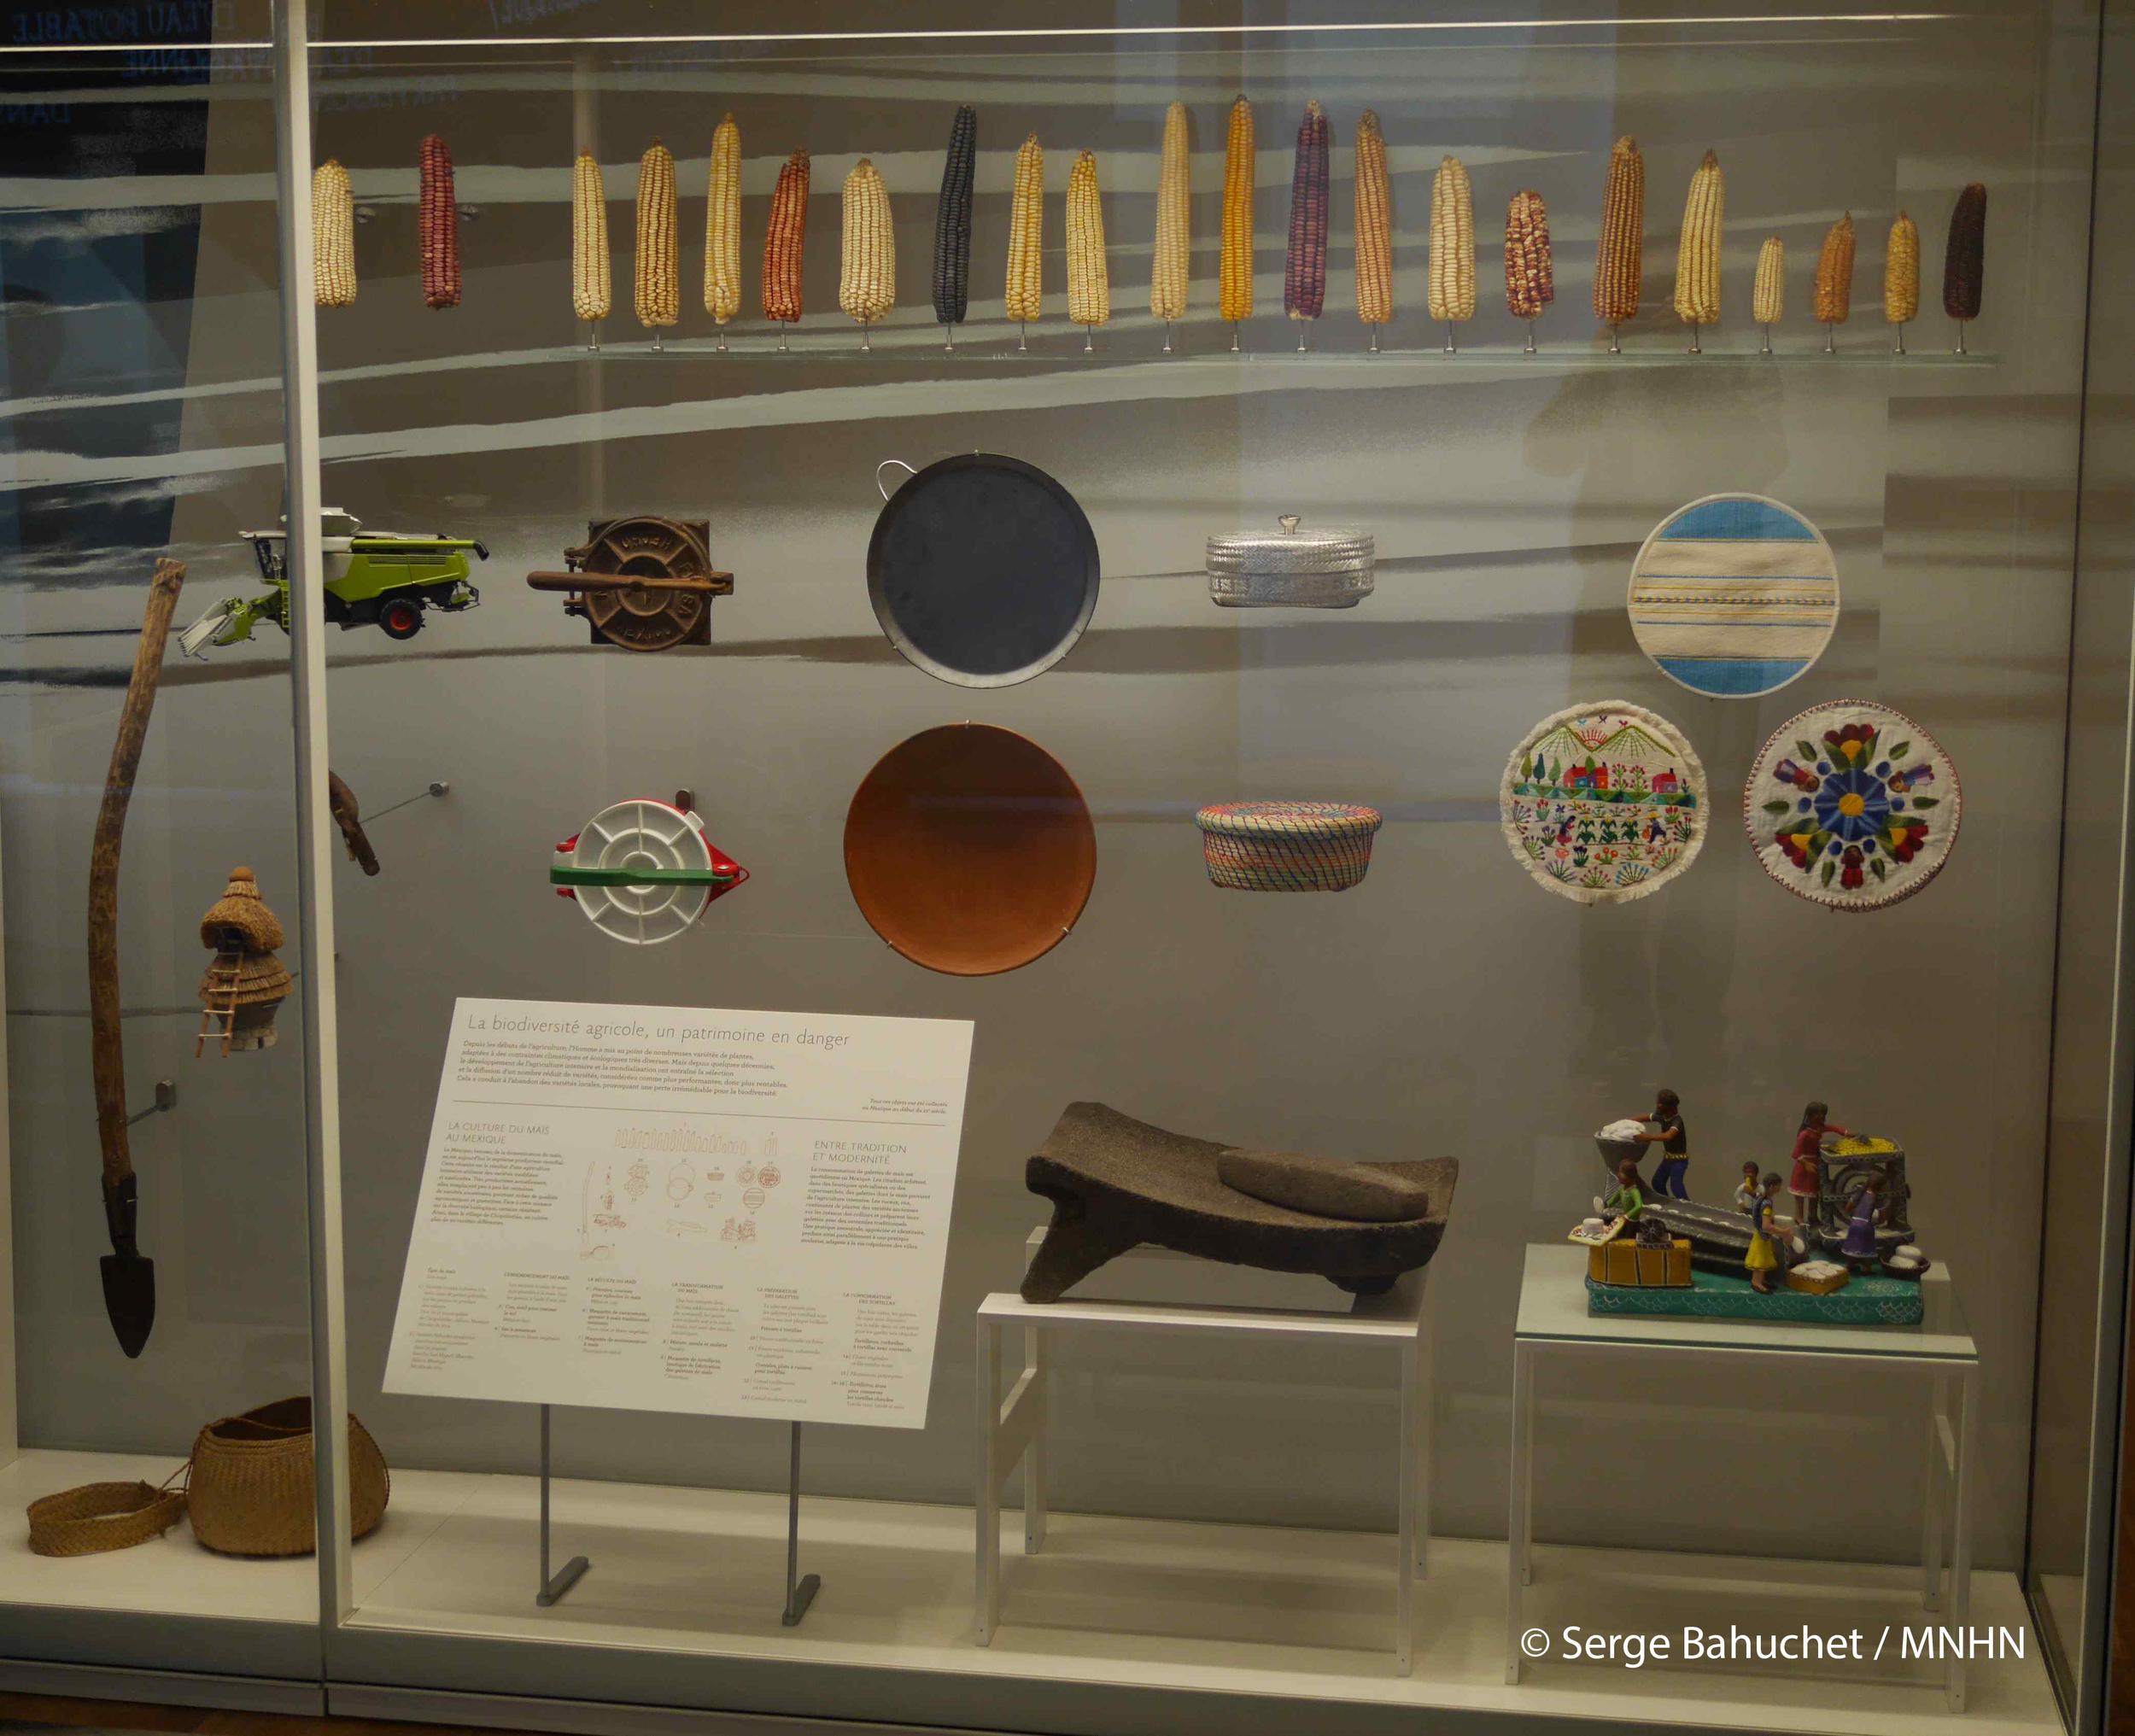 Vitrina en Museo del Hombre, París. Fotografía: Serge Bahuchet /MNHN